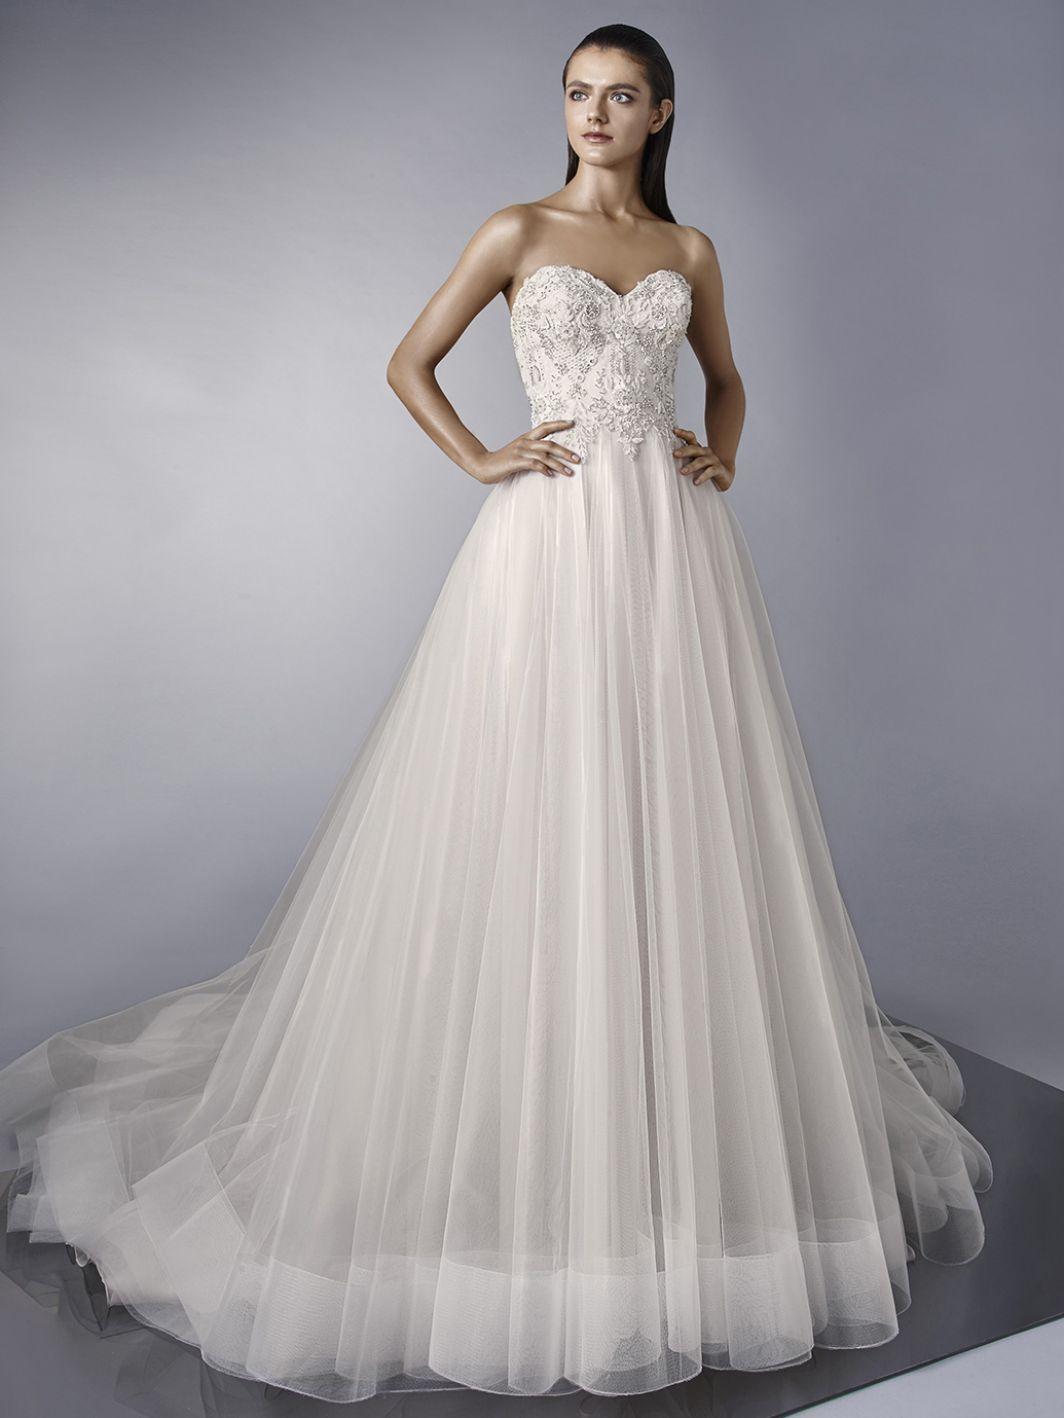 Oriental Wedding Dress 51 New enzoani bridal collection enzoani